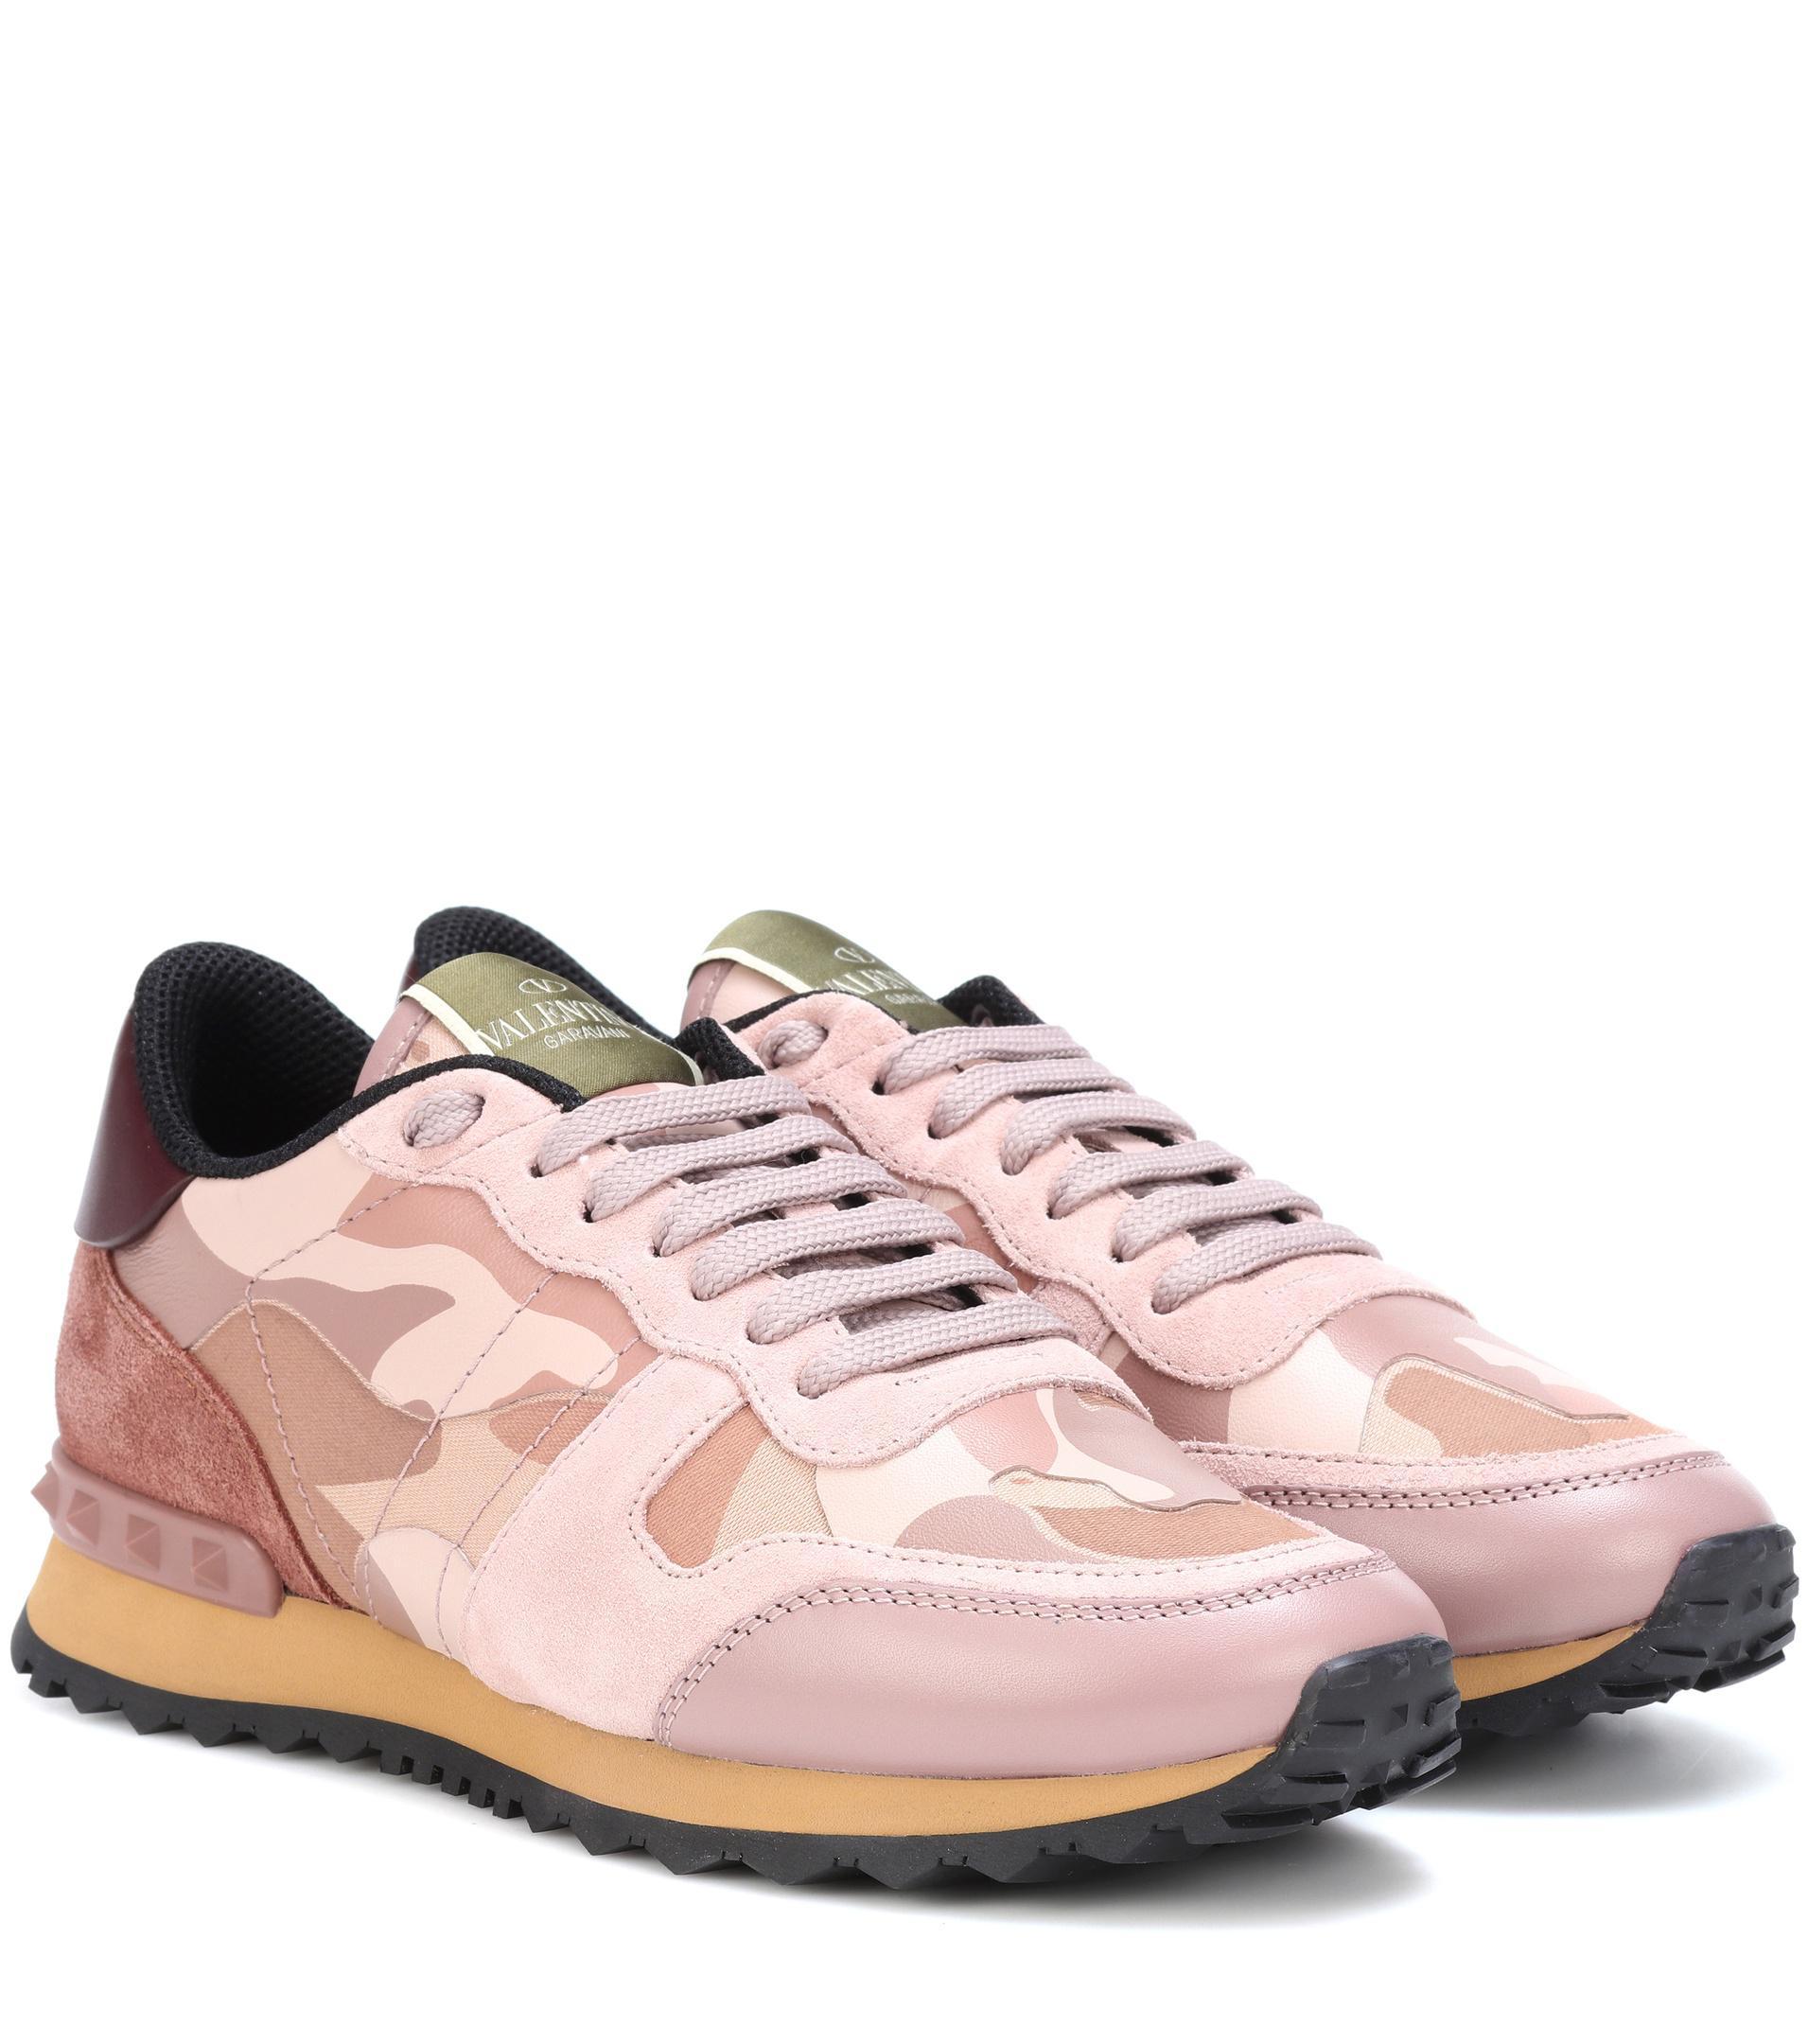 Rockrunner sneakers - Pink & Purple Valentino r0otb